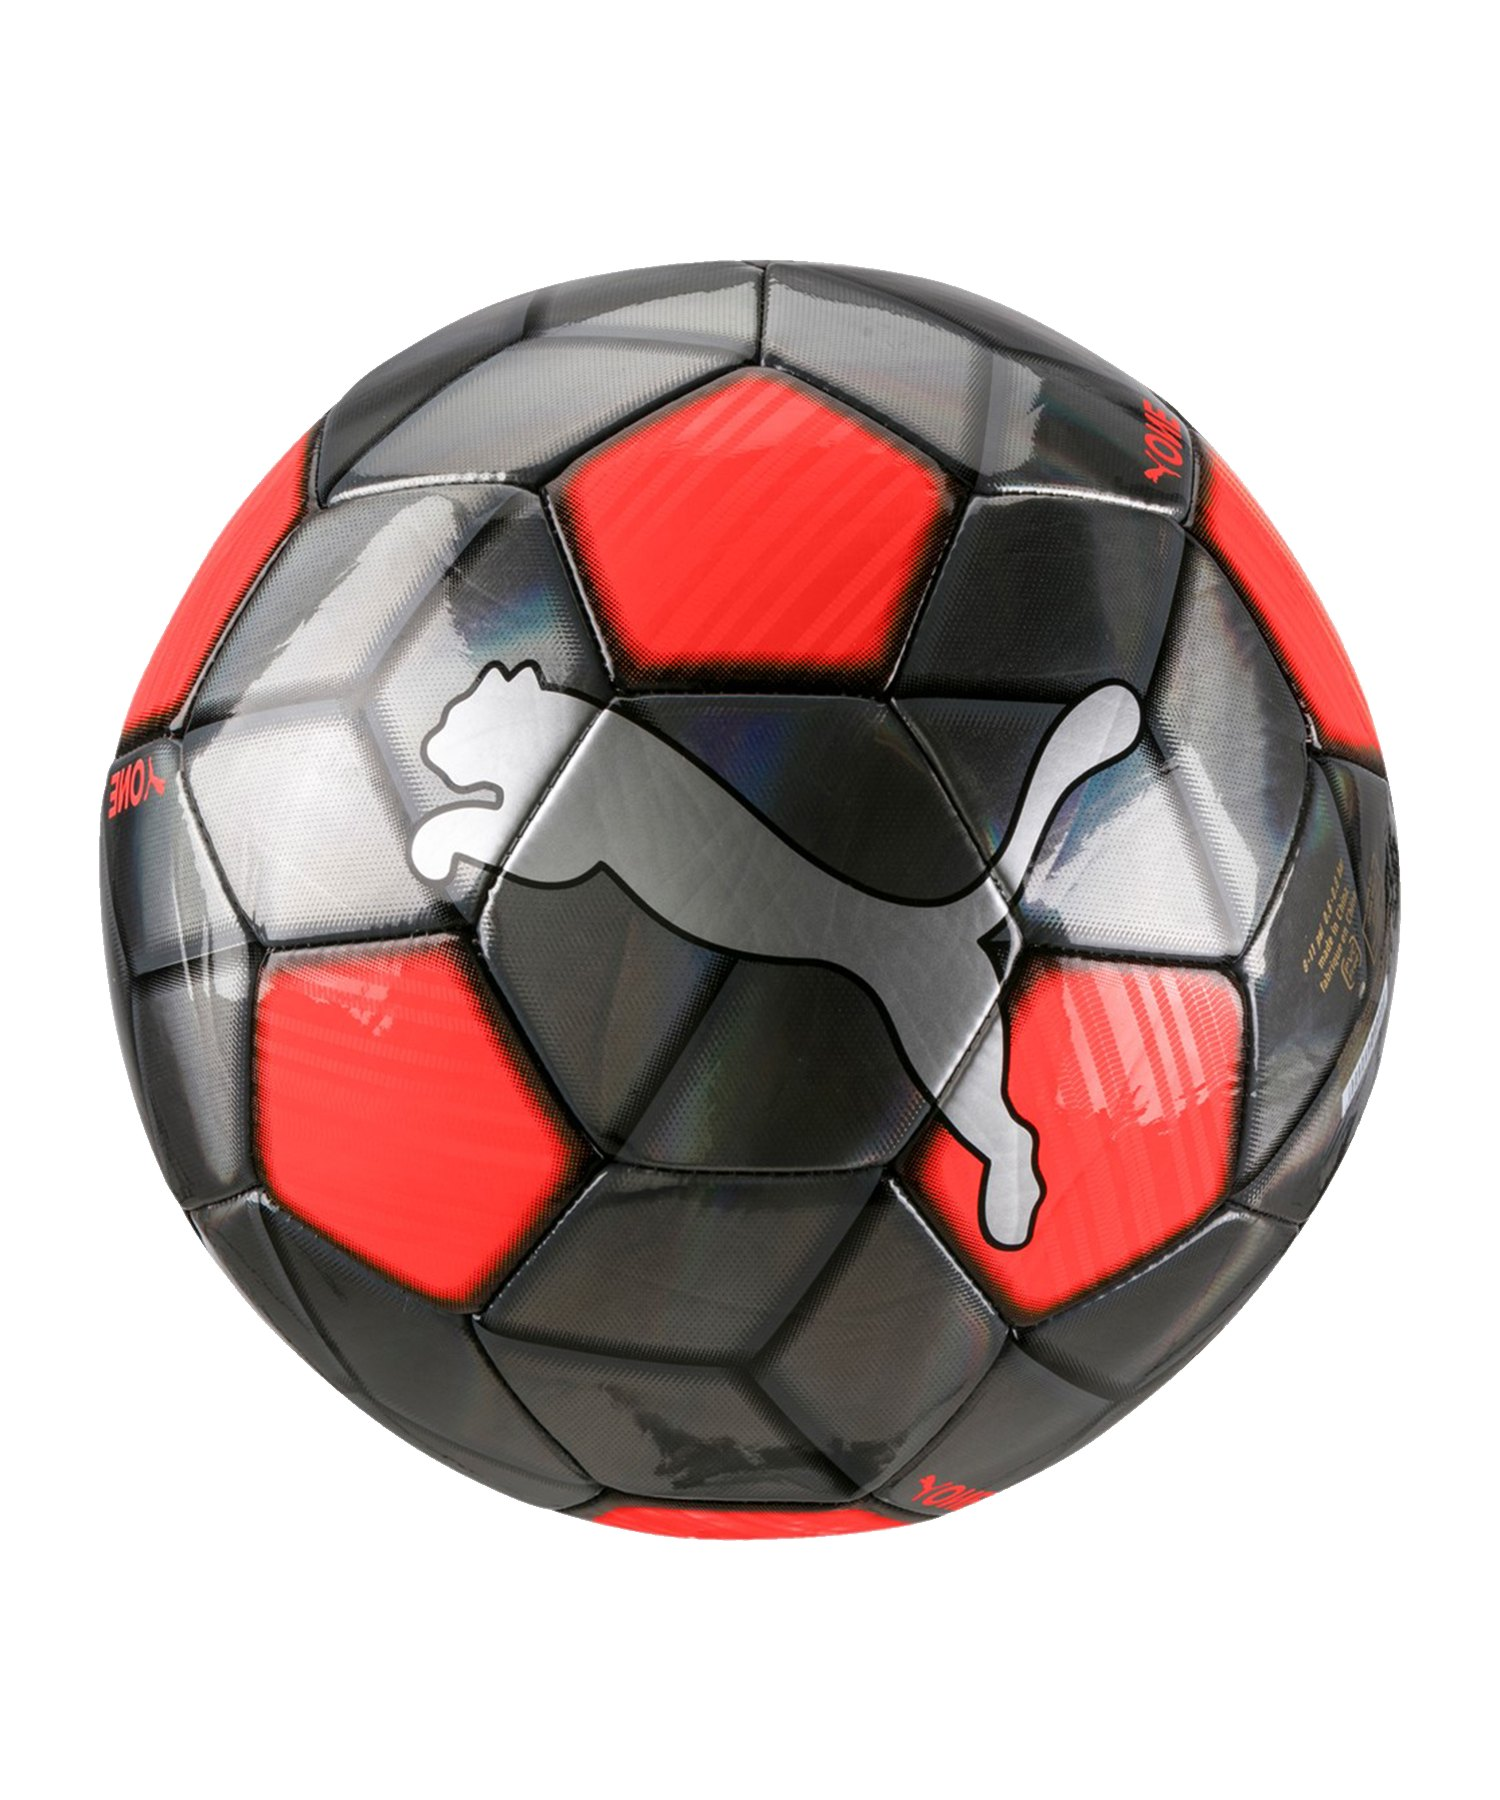 PUMA ONE Strap Trainingsball Silber Rot F01 - Silber